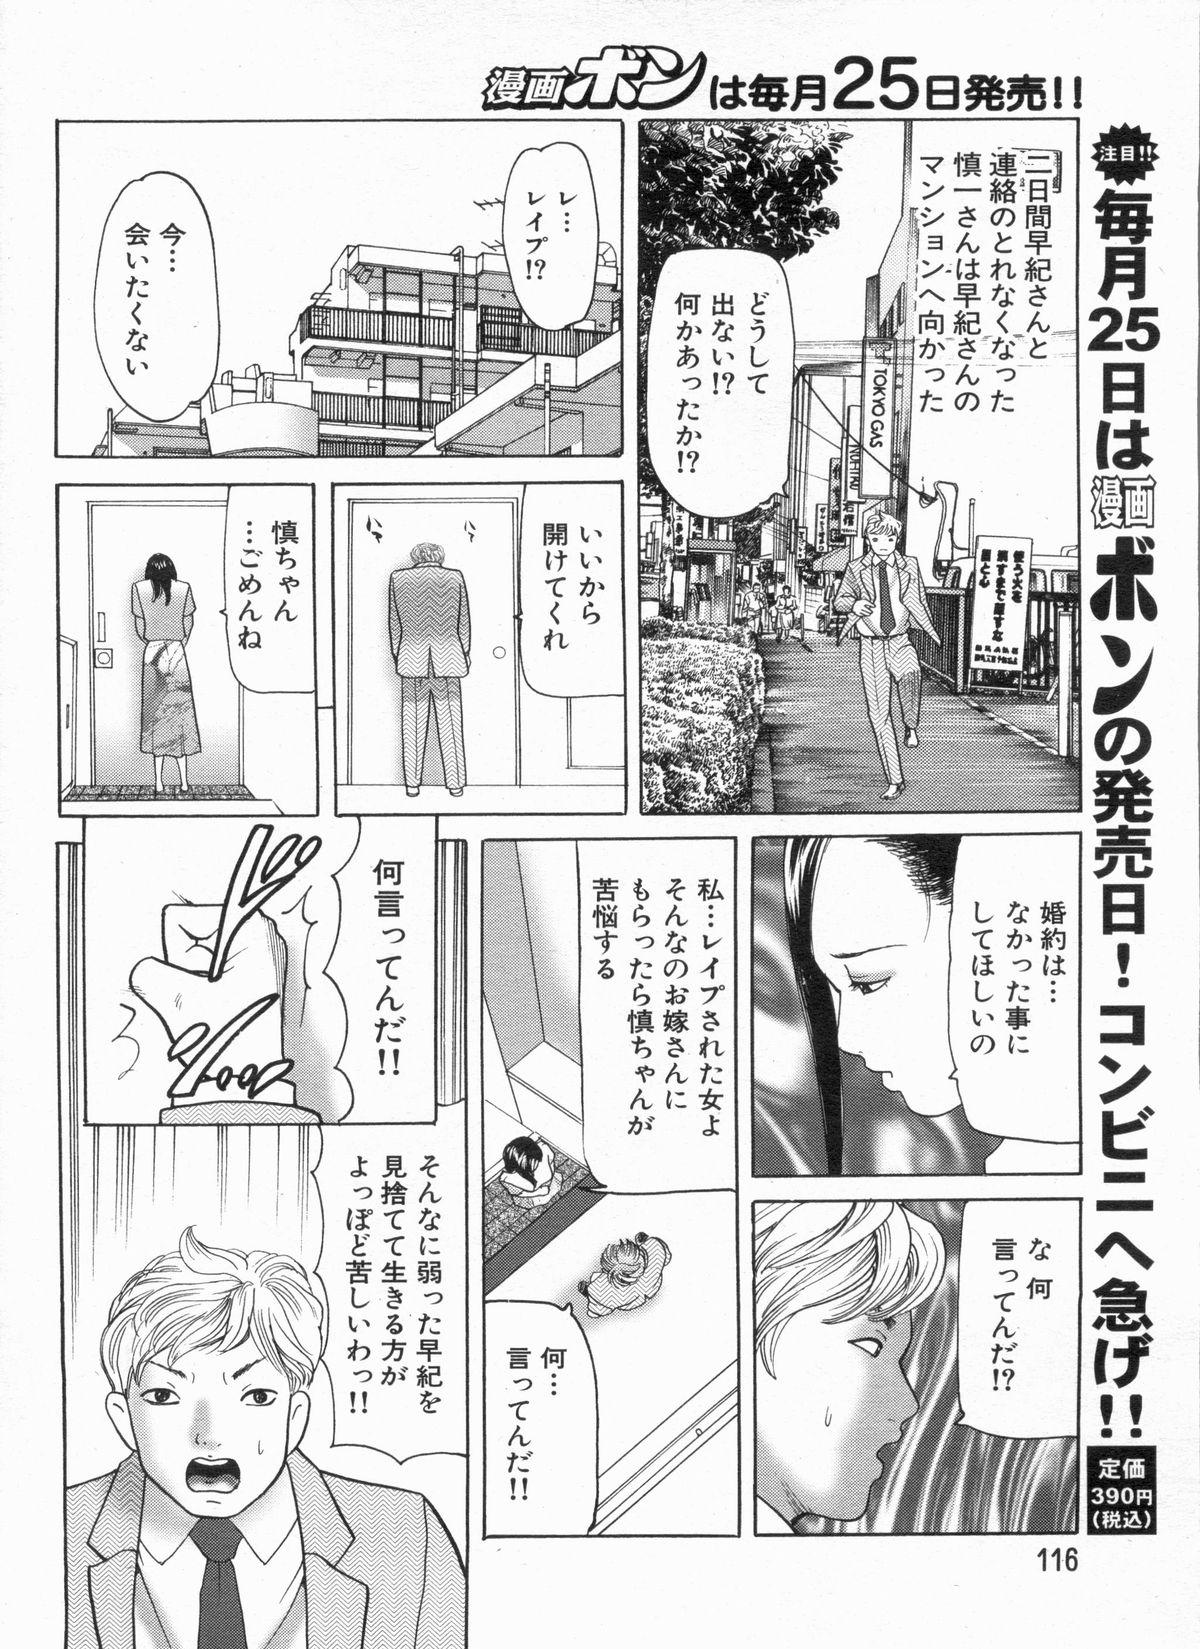 Manga Bon 2013-03 114